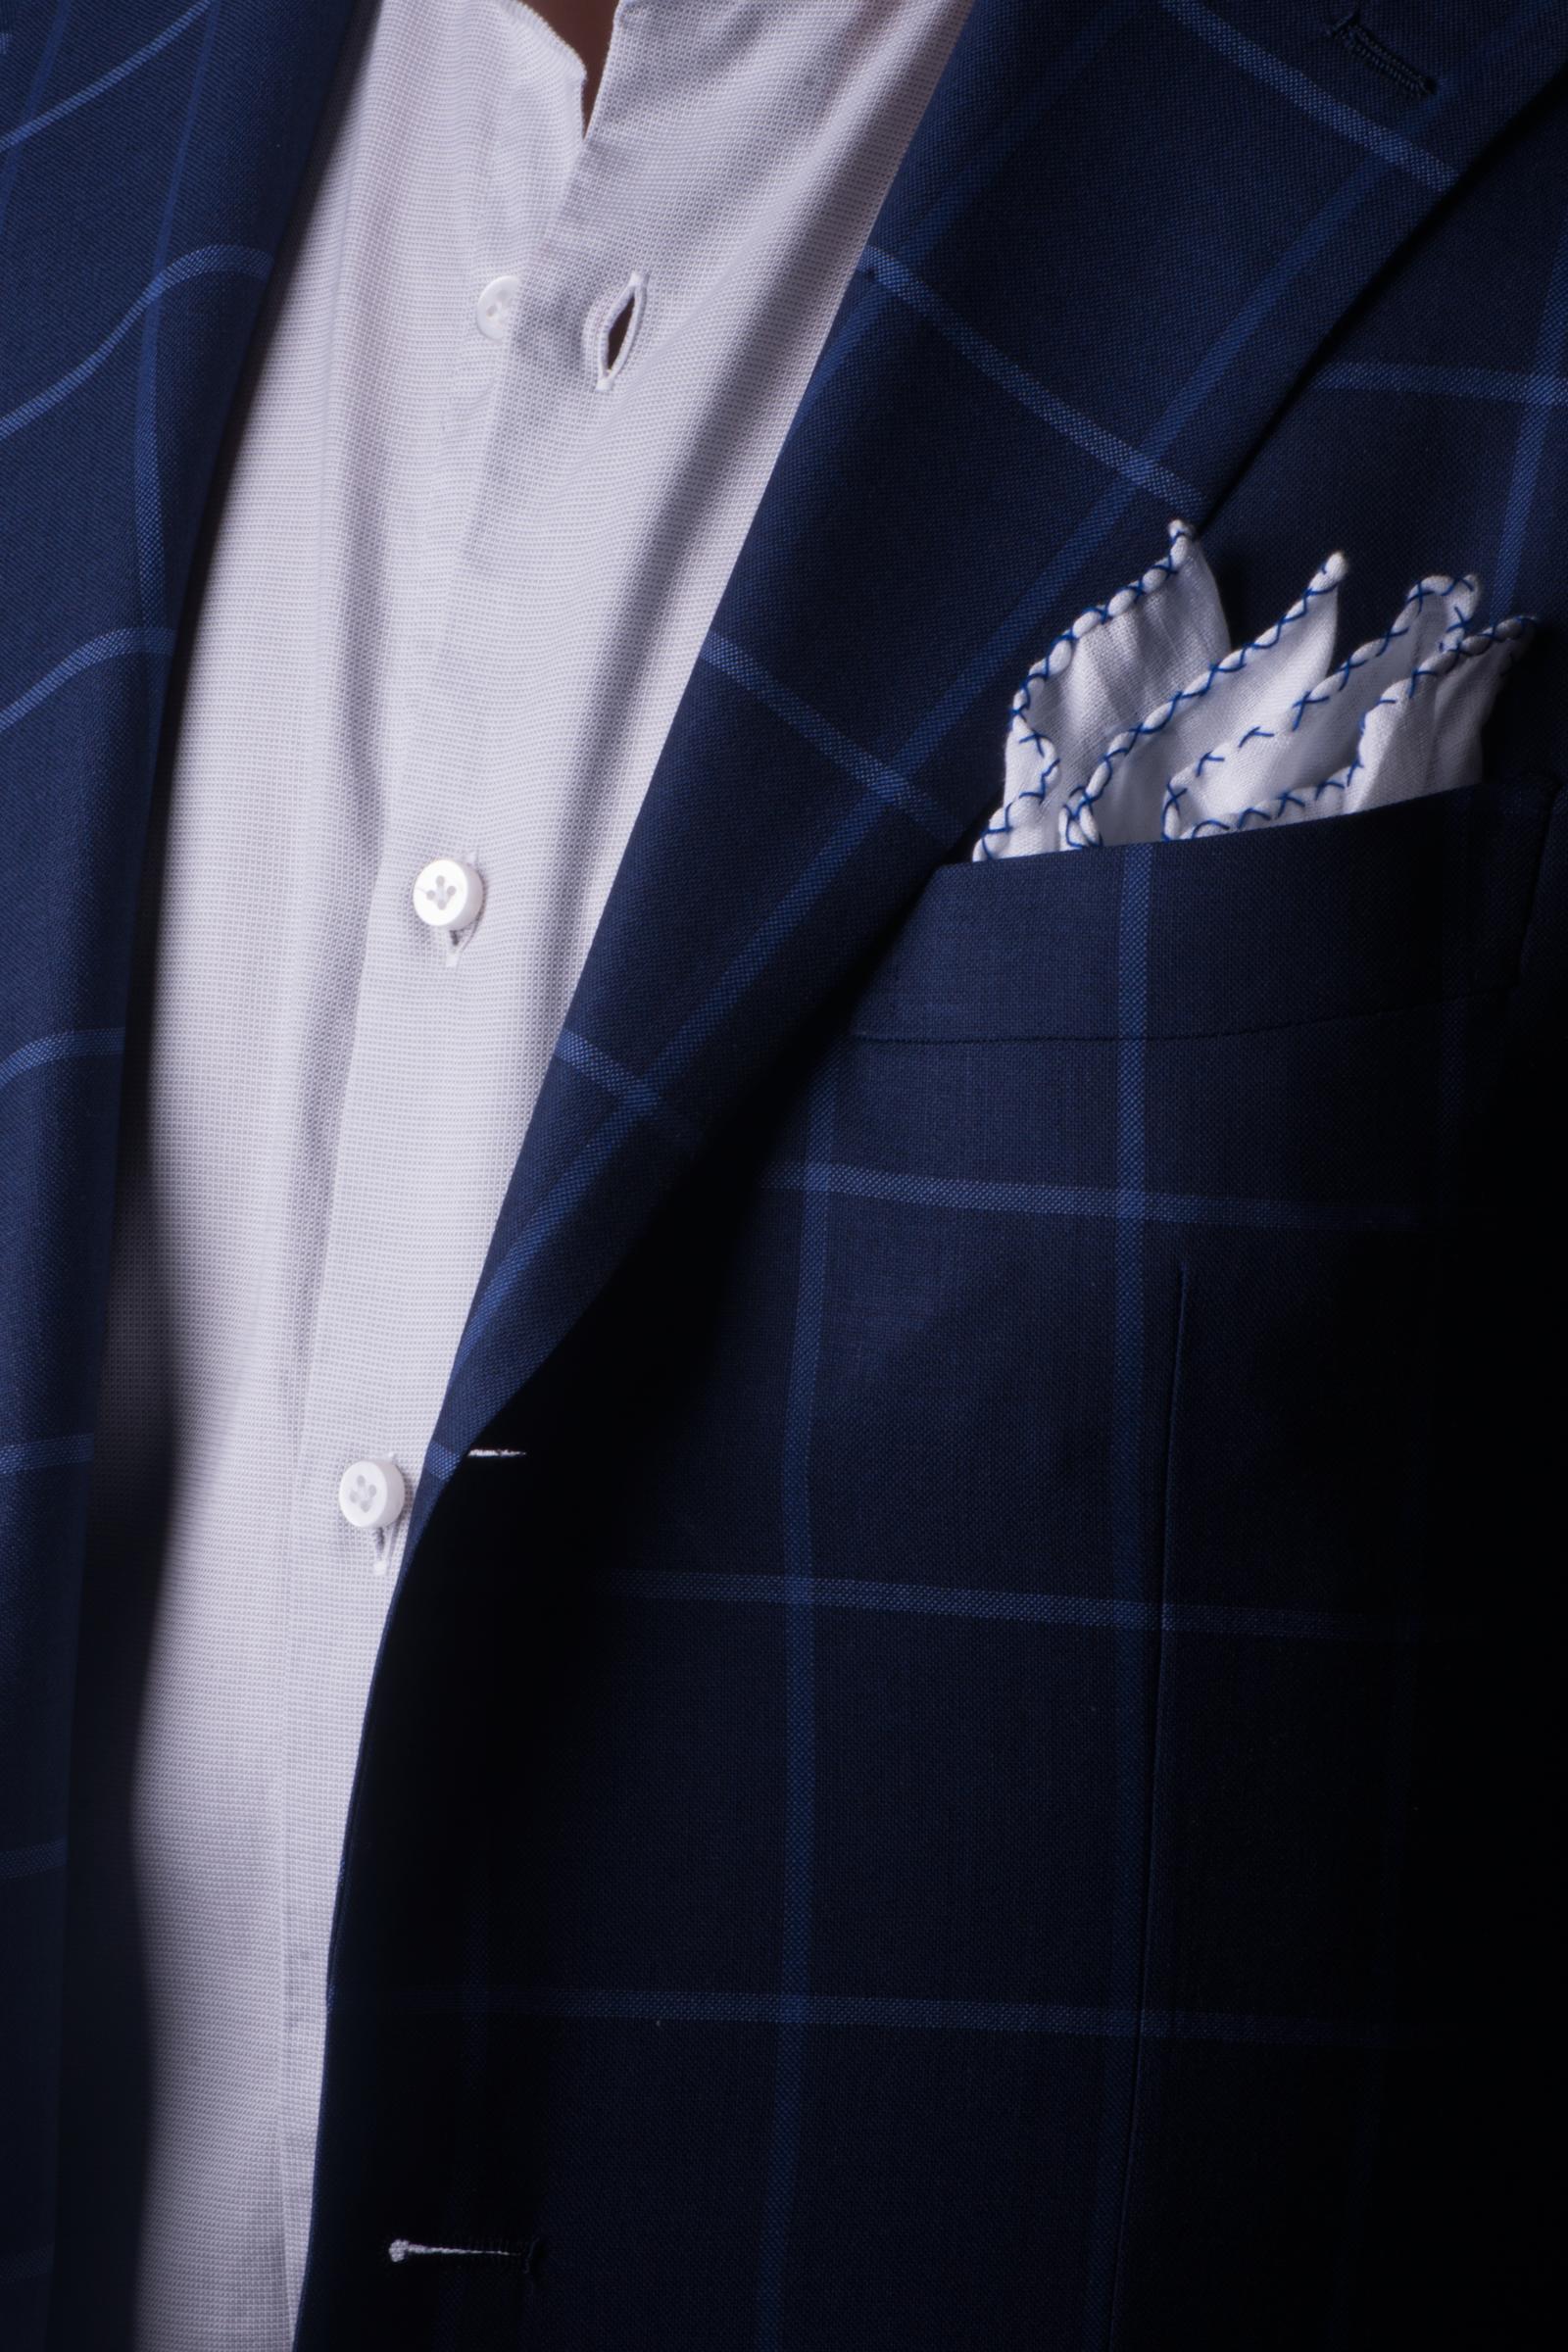 custom-suit-windowpane-pocket-square